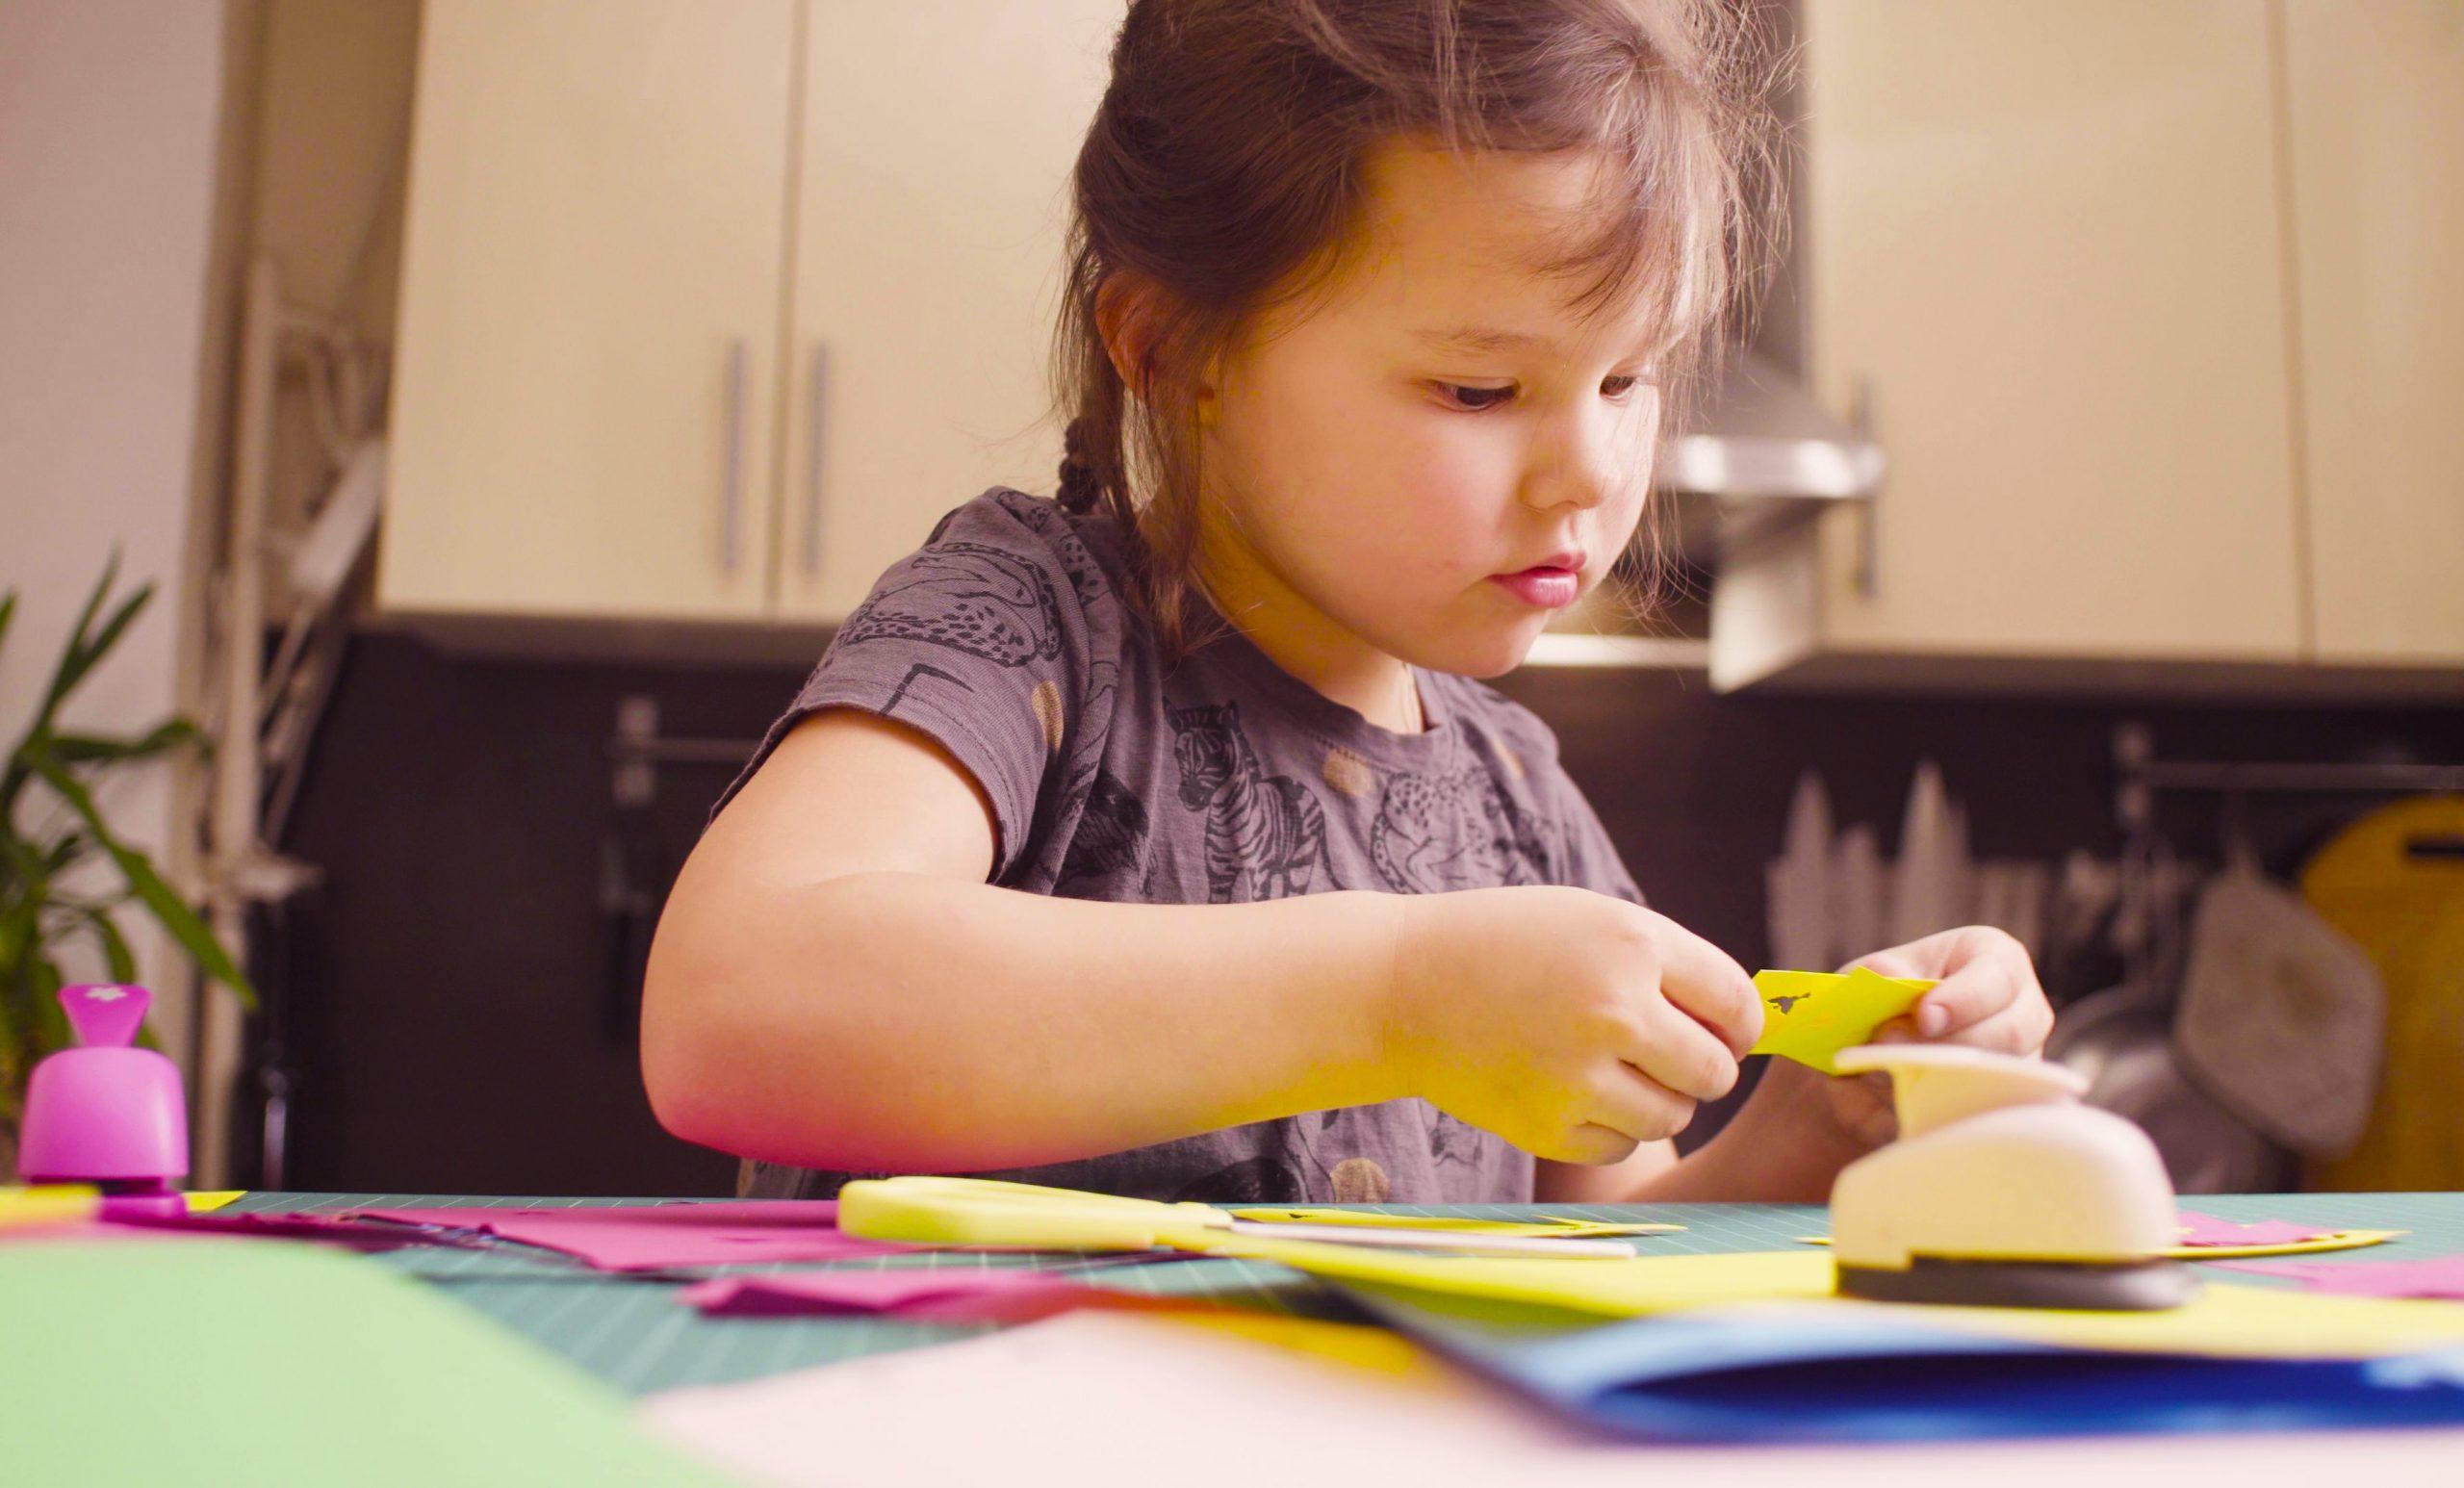 Little Girl Doing Crafts